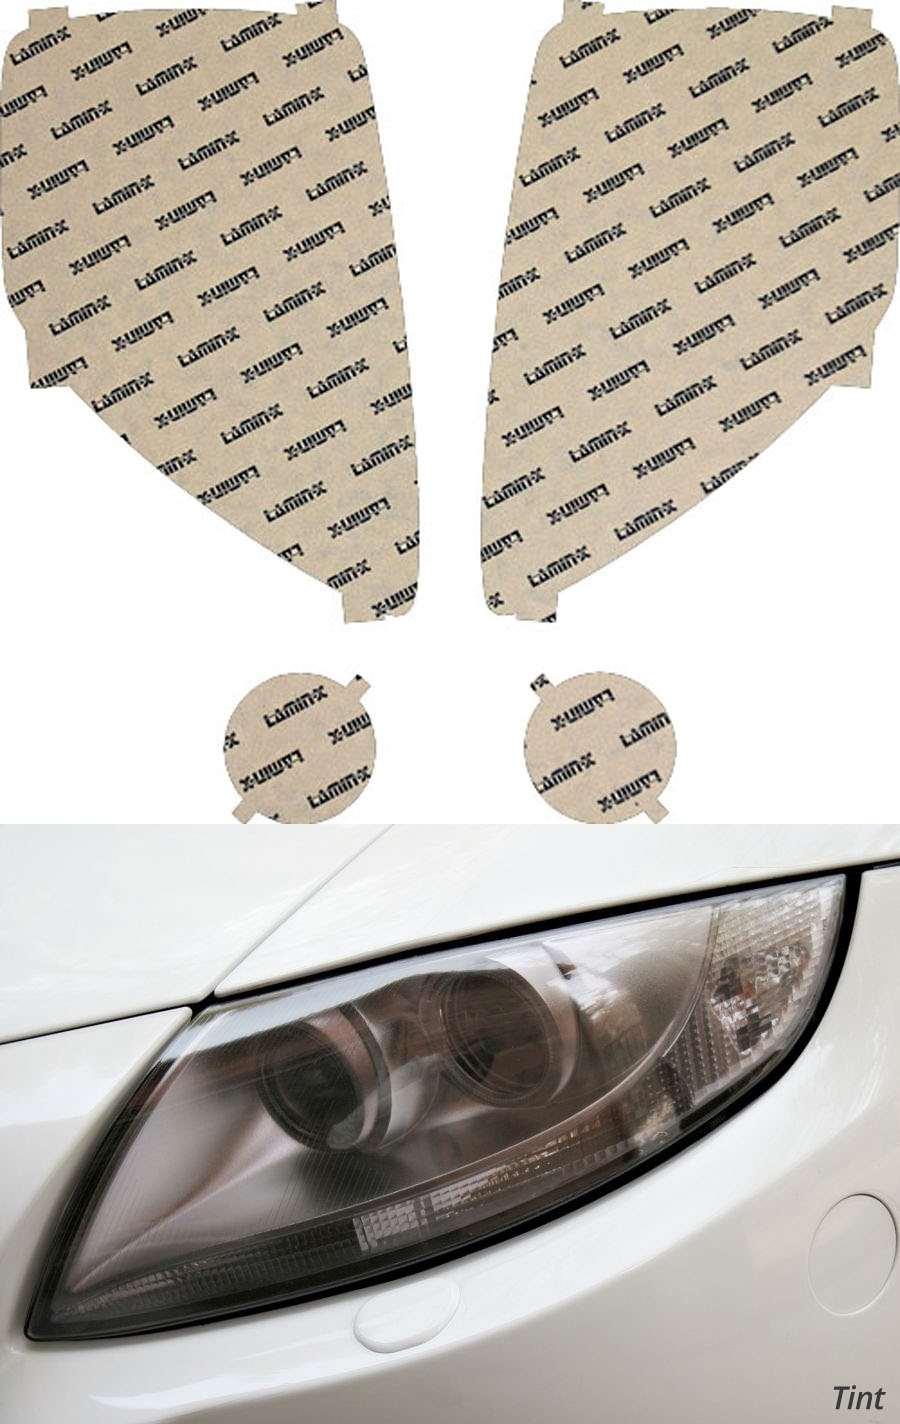 Mitsubishi Eclipse 01-05 Tint Headlight Covers Lamin-X MT002T